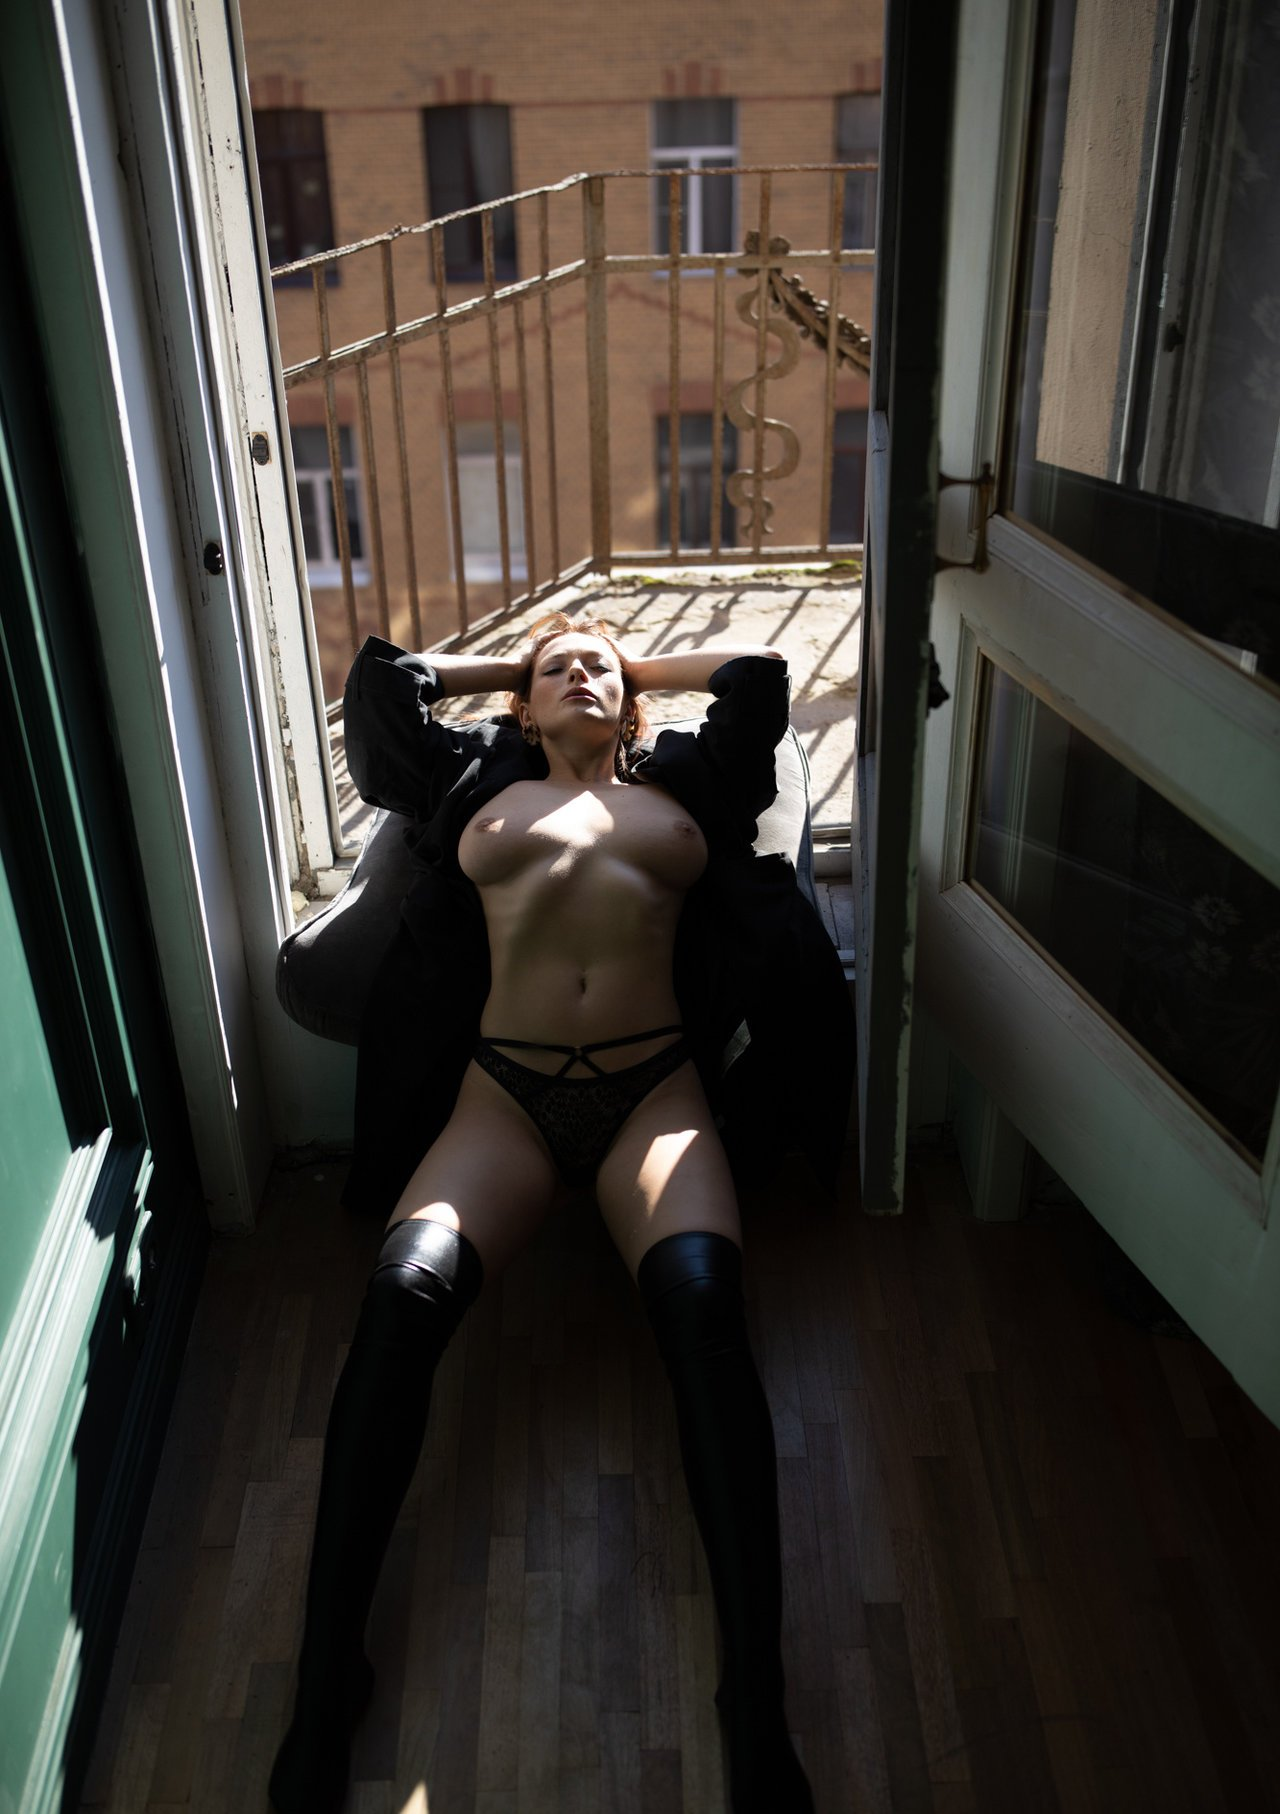 Olga Kobzar Bugs Bunny Gf Nudes Leaks 0011